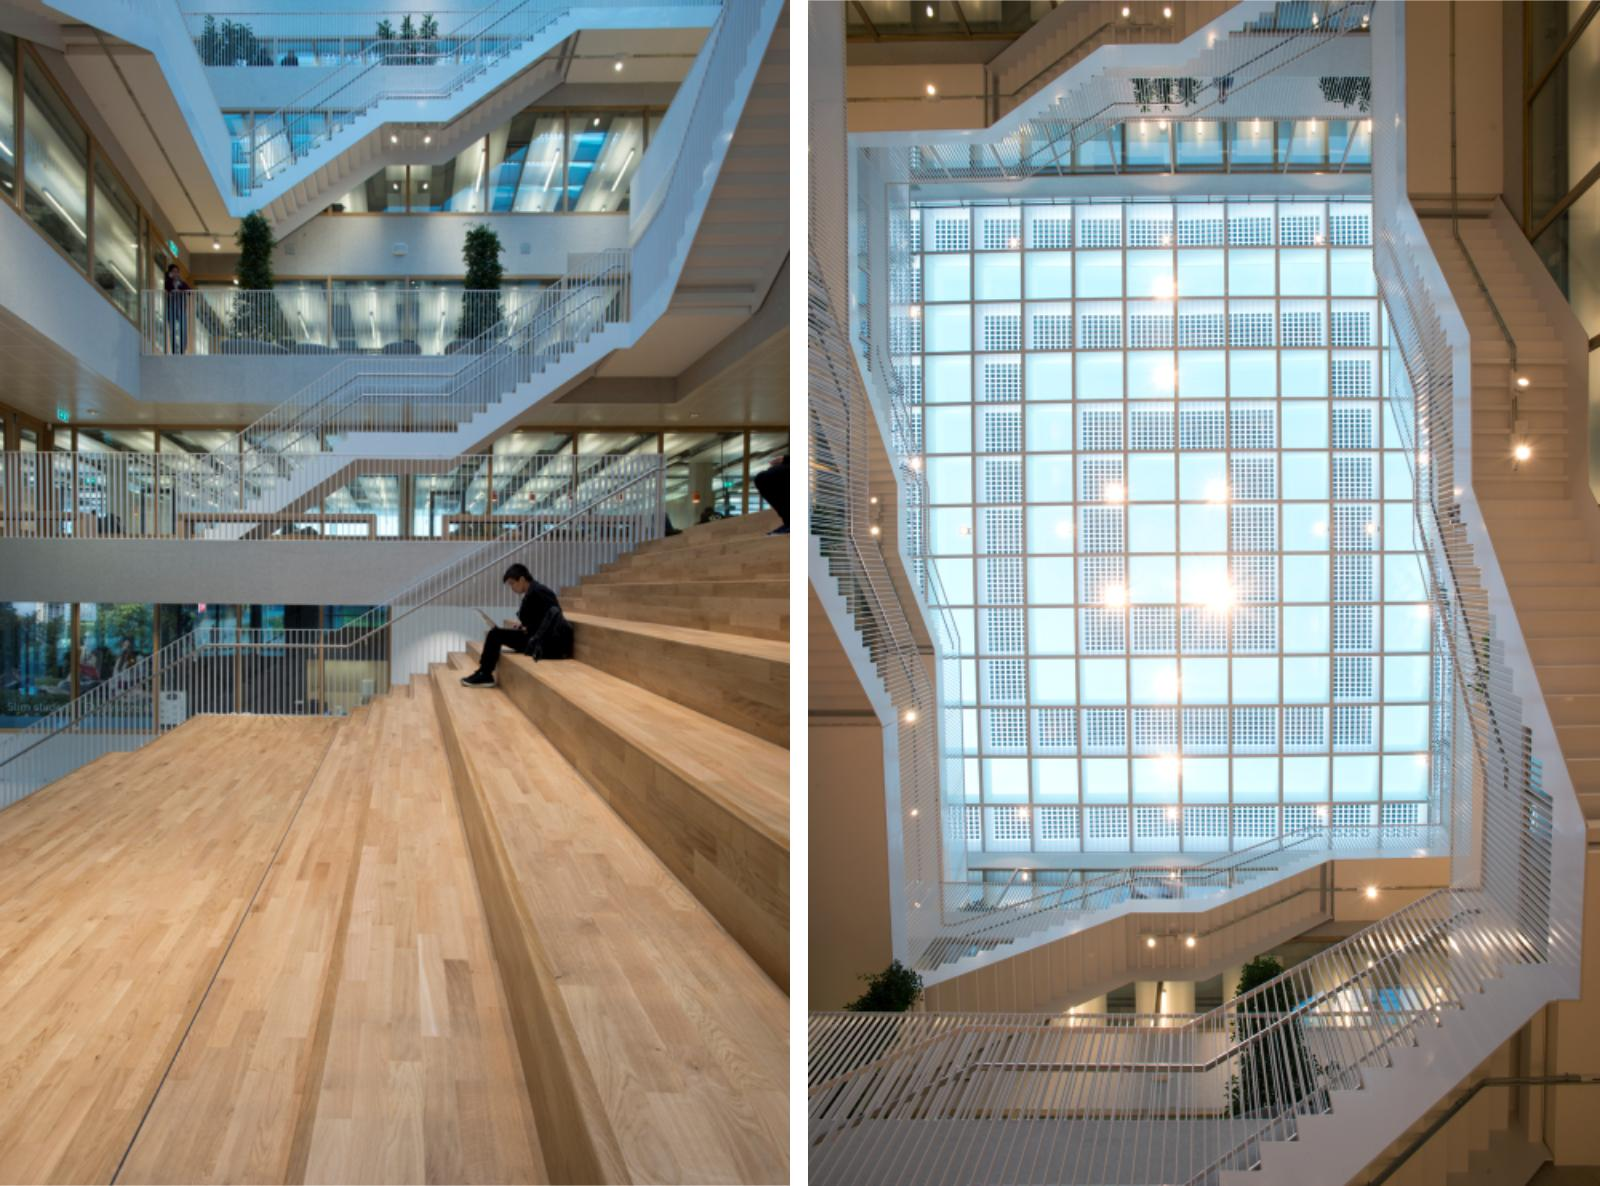 Polak Building Erasmus University Rotterdam By Paul De Ruiter Architects 10